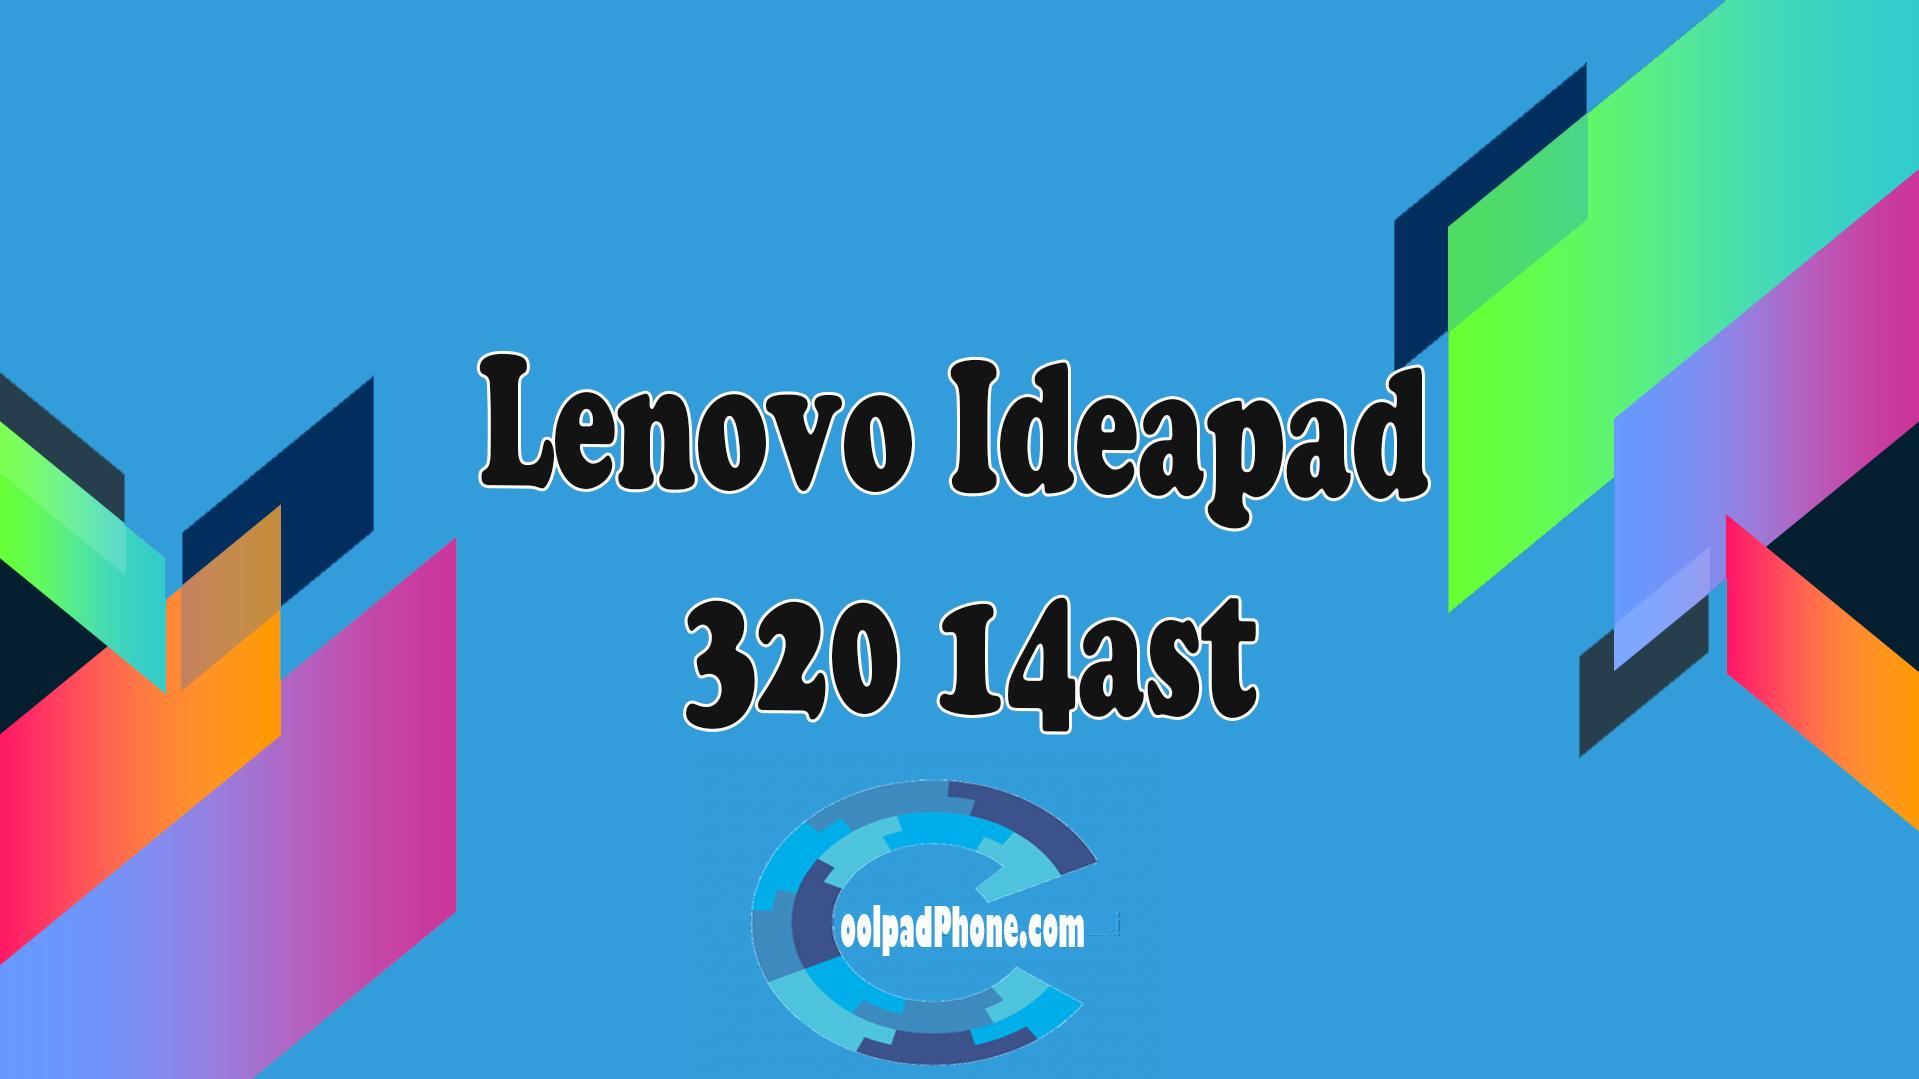 LLenovo Ideapad 320 14ast